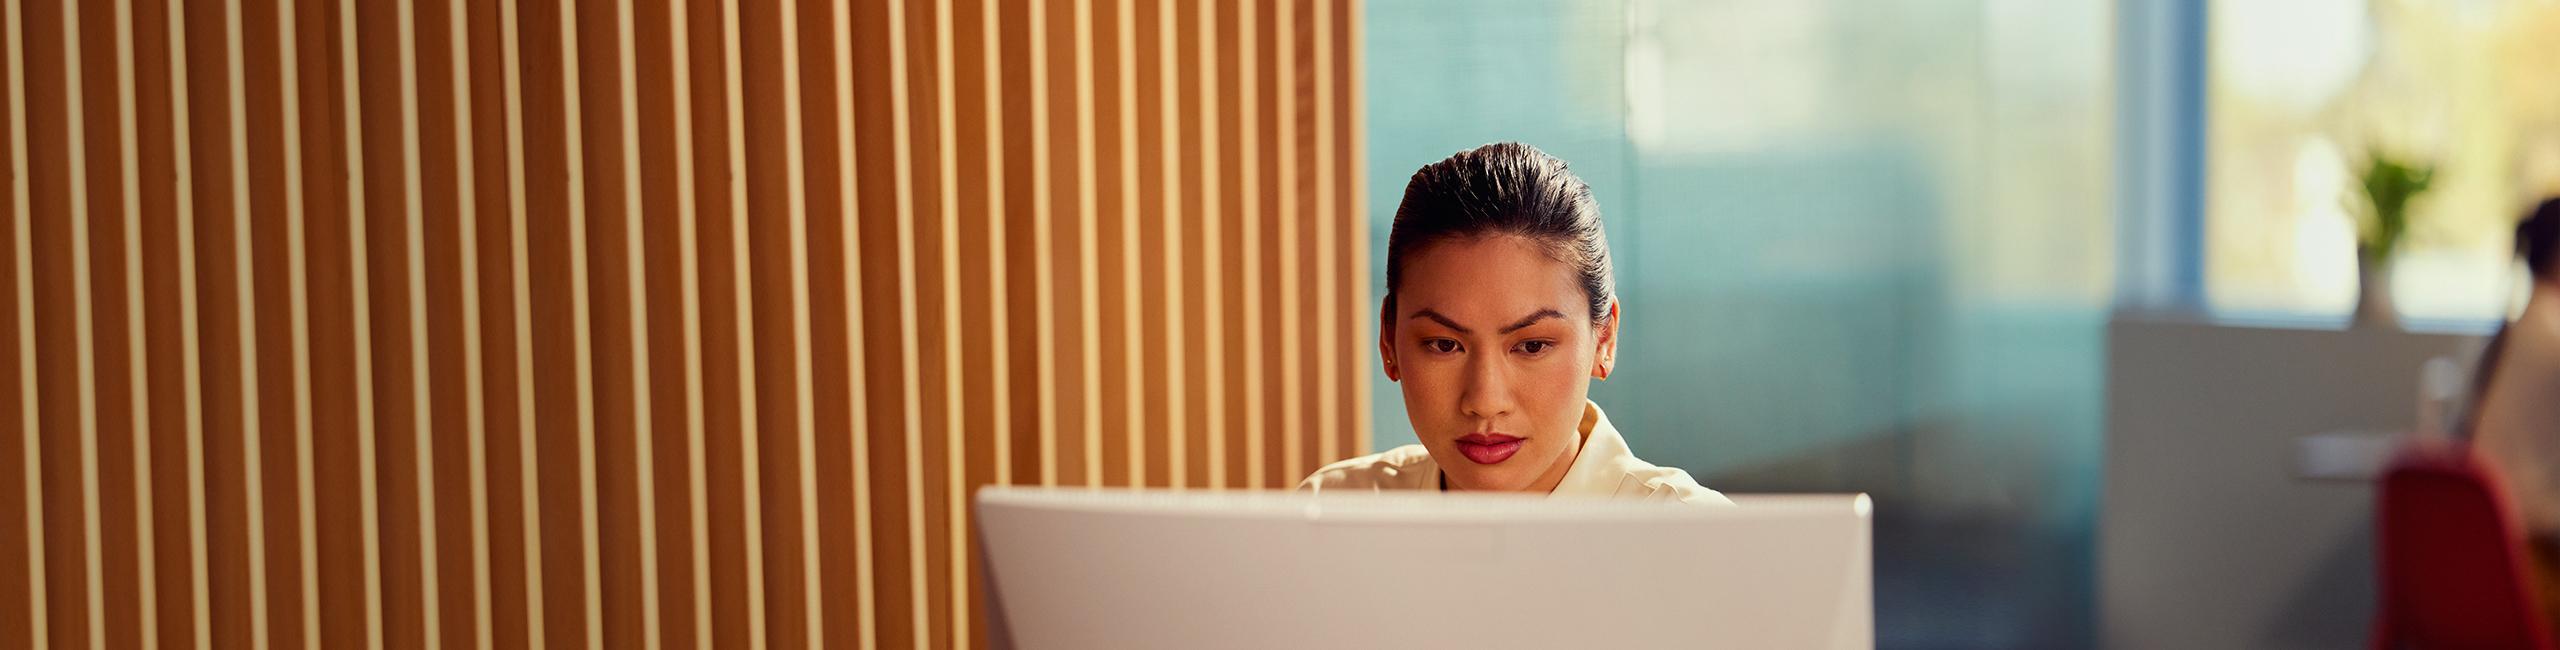 Exploring the Genomic Diversity of Africa